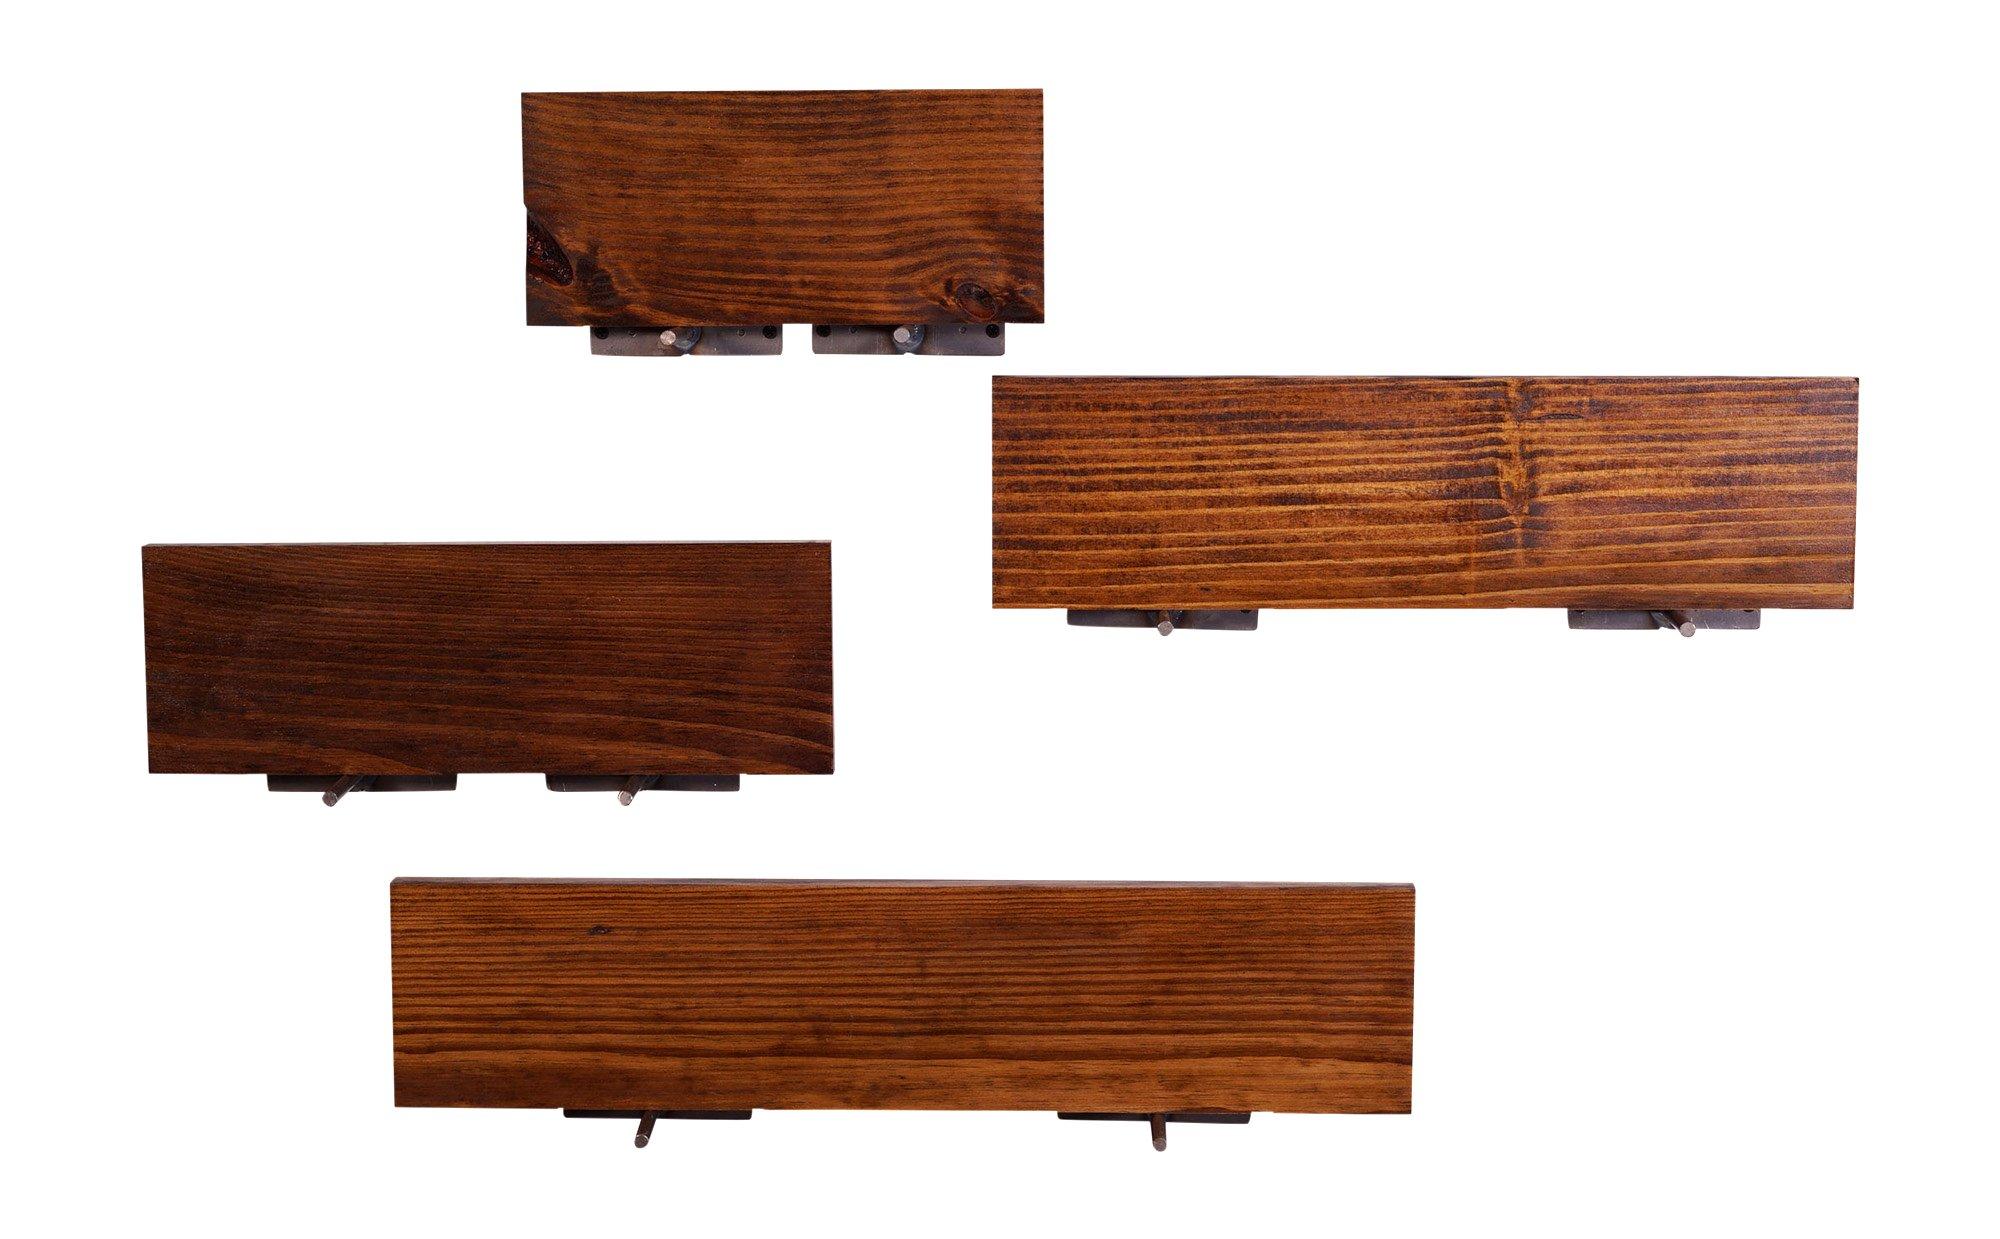 DAKODA LOVE Routed Edge Floating Shelves, USA Handmade, Clear Coat Finish, 100% Countersunk Hidden Floating Shelf Brackets, Beautiful Grain Pine Wood Wall Decor (Set of 4) (Bourbon) by DAKODA LOVE (Image #4)